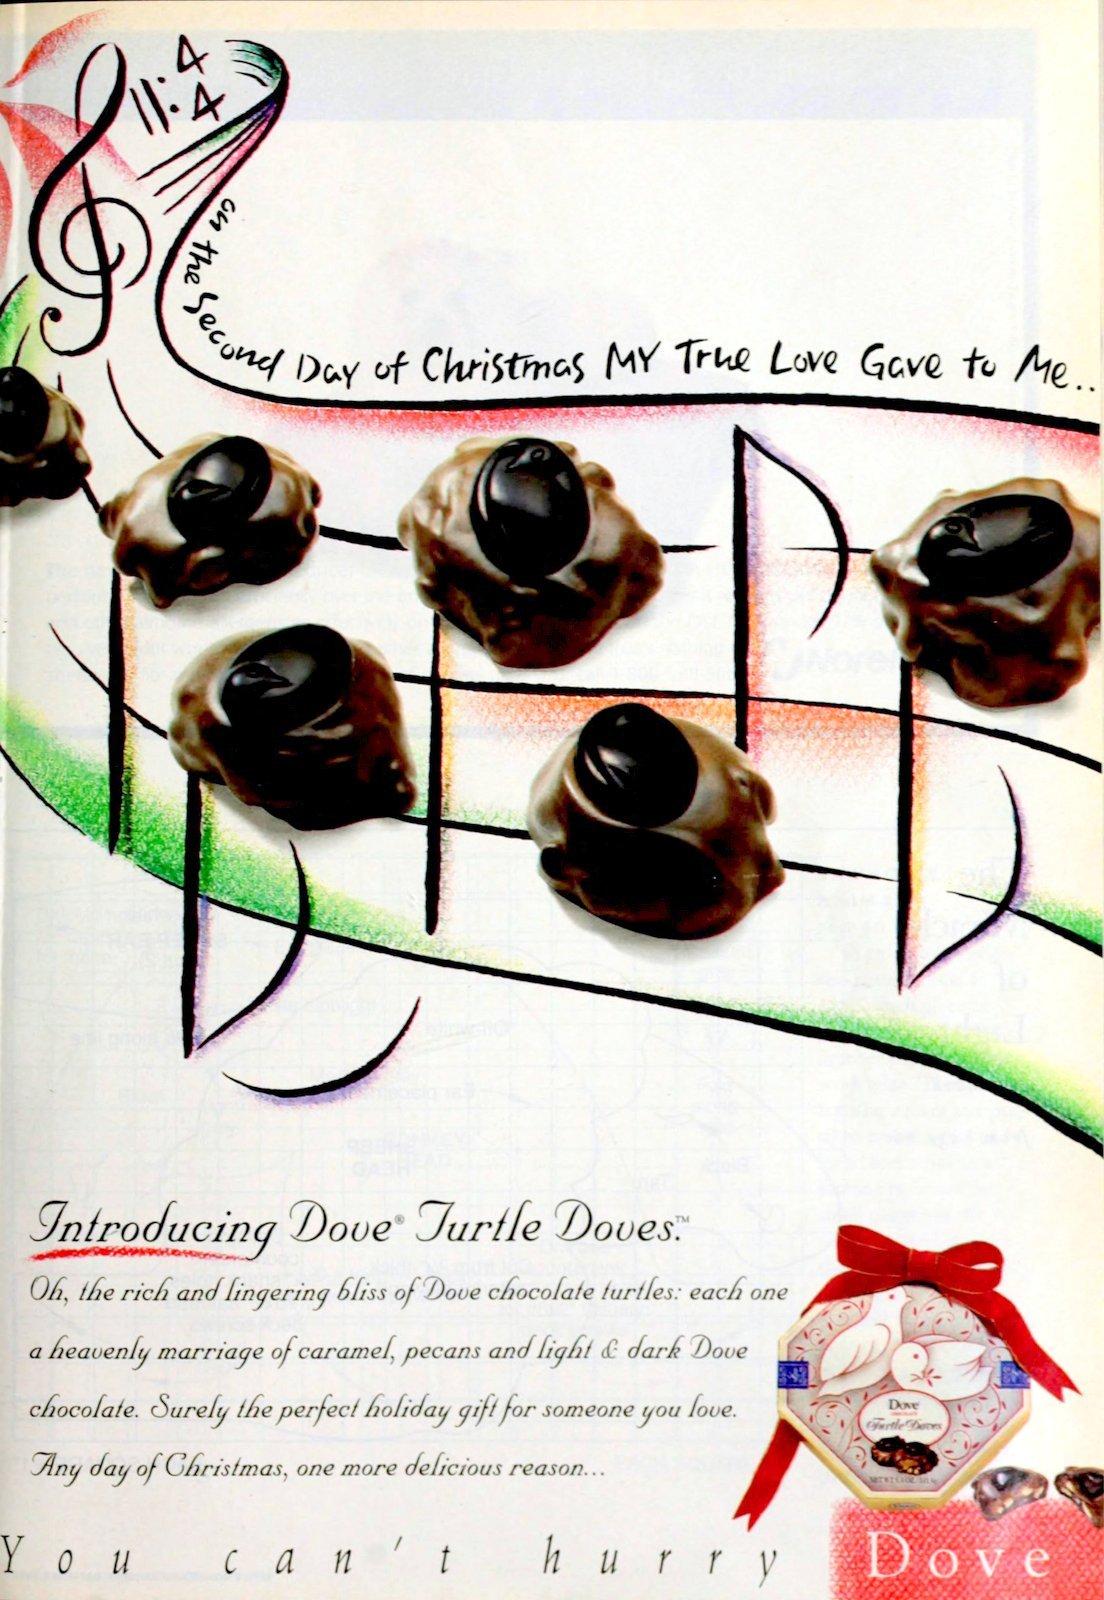 Vintage 90s Dove Turtle Doves chocolate candies (1996)